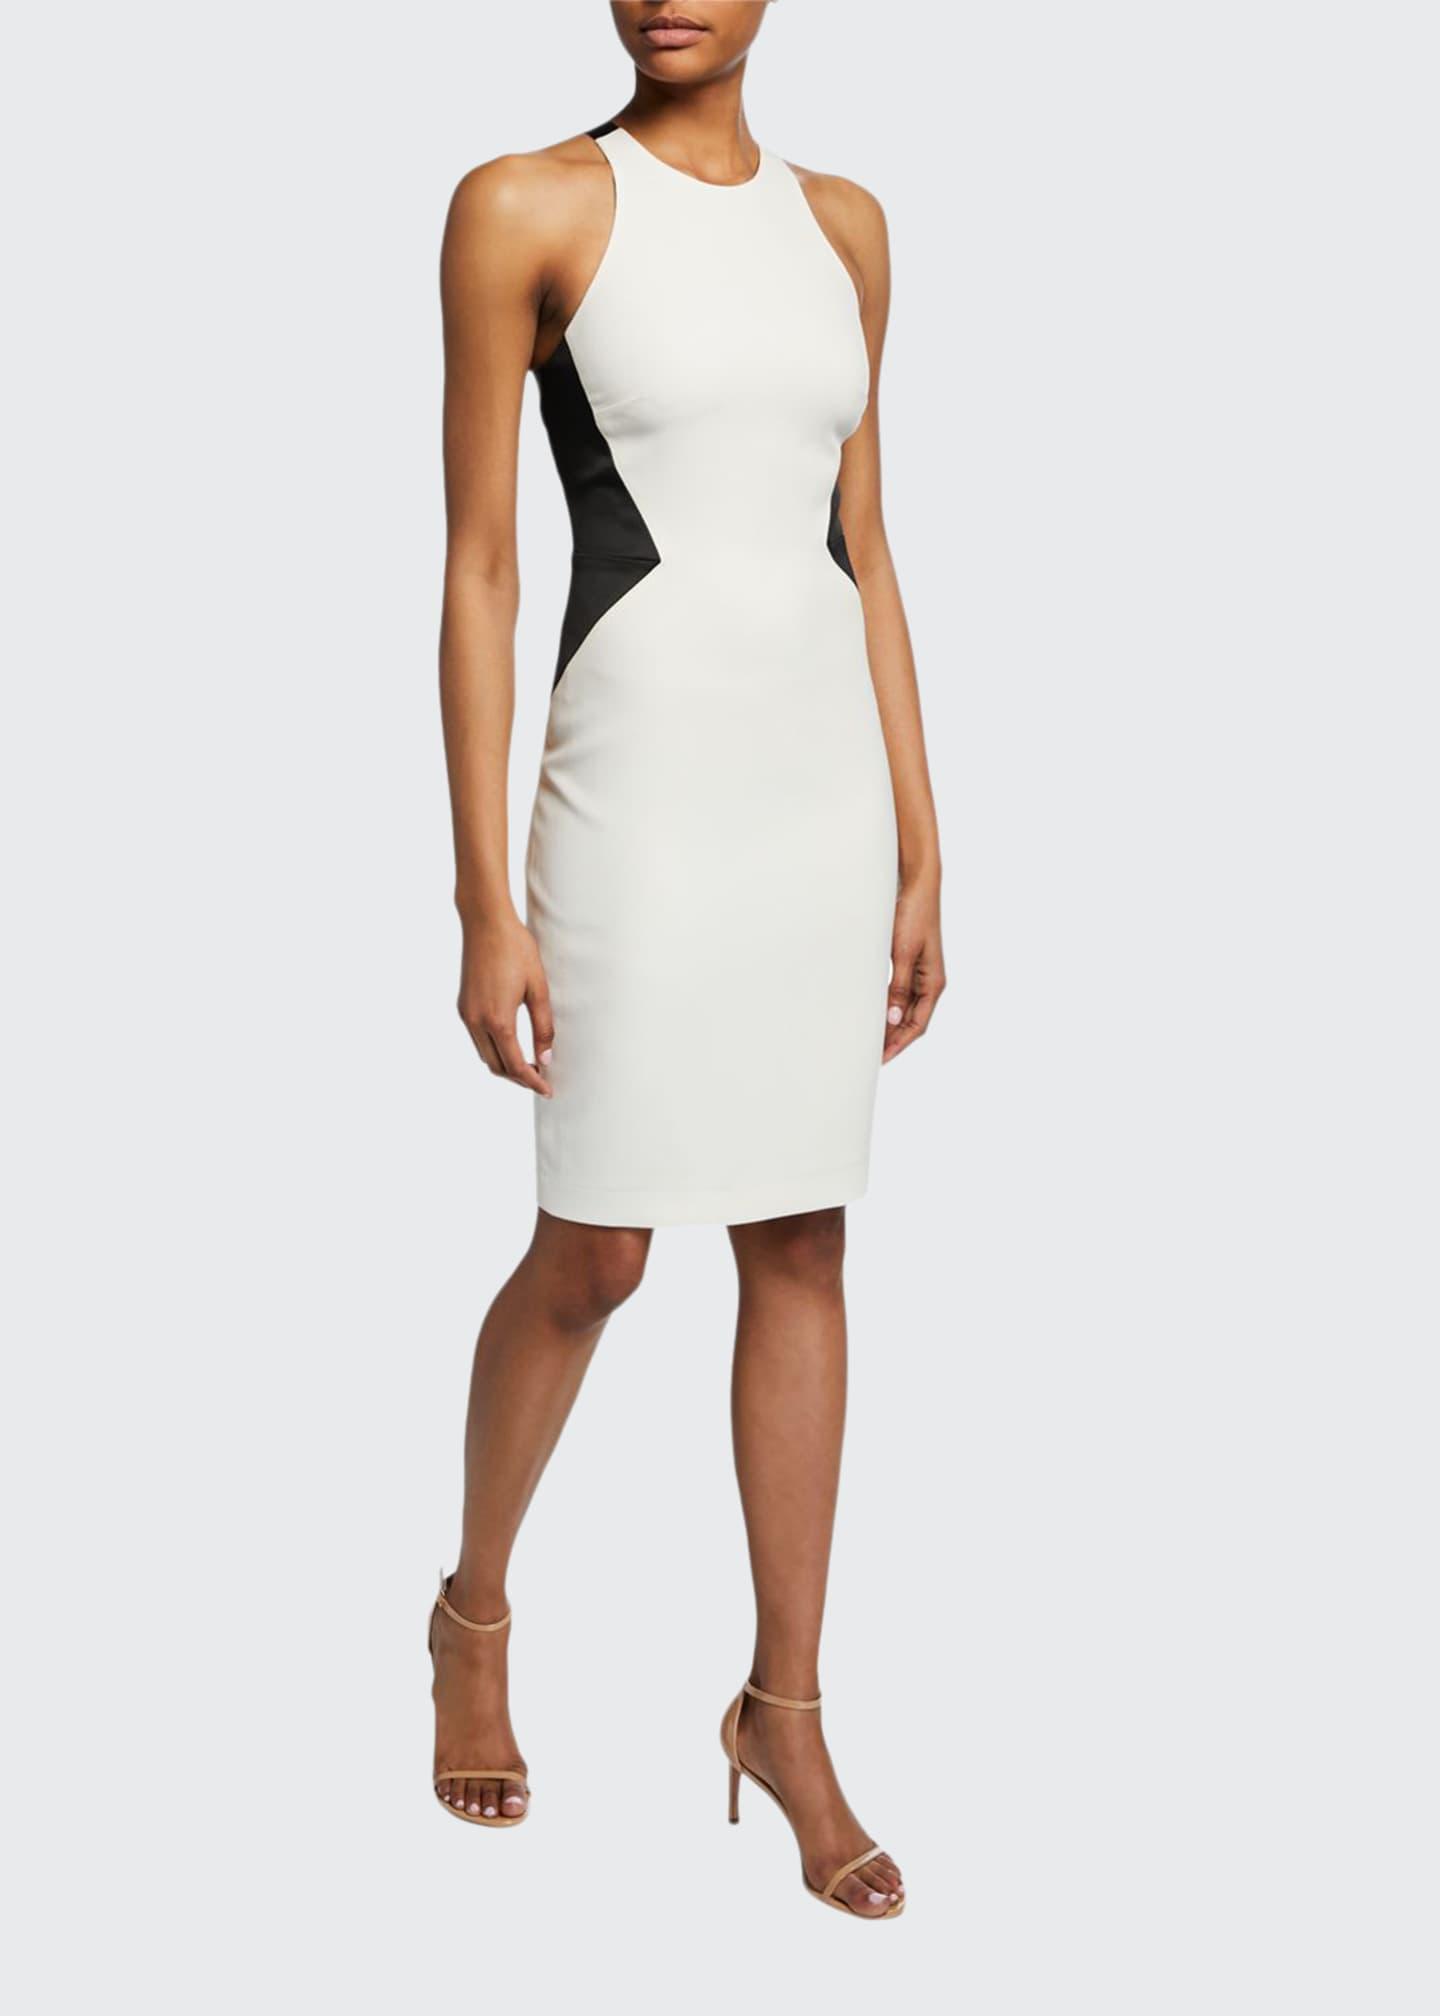 Halston Sleeveless Halter-Neck Dress with Strap Detail